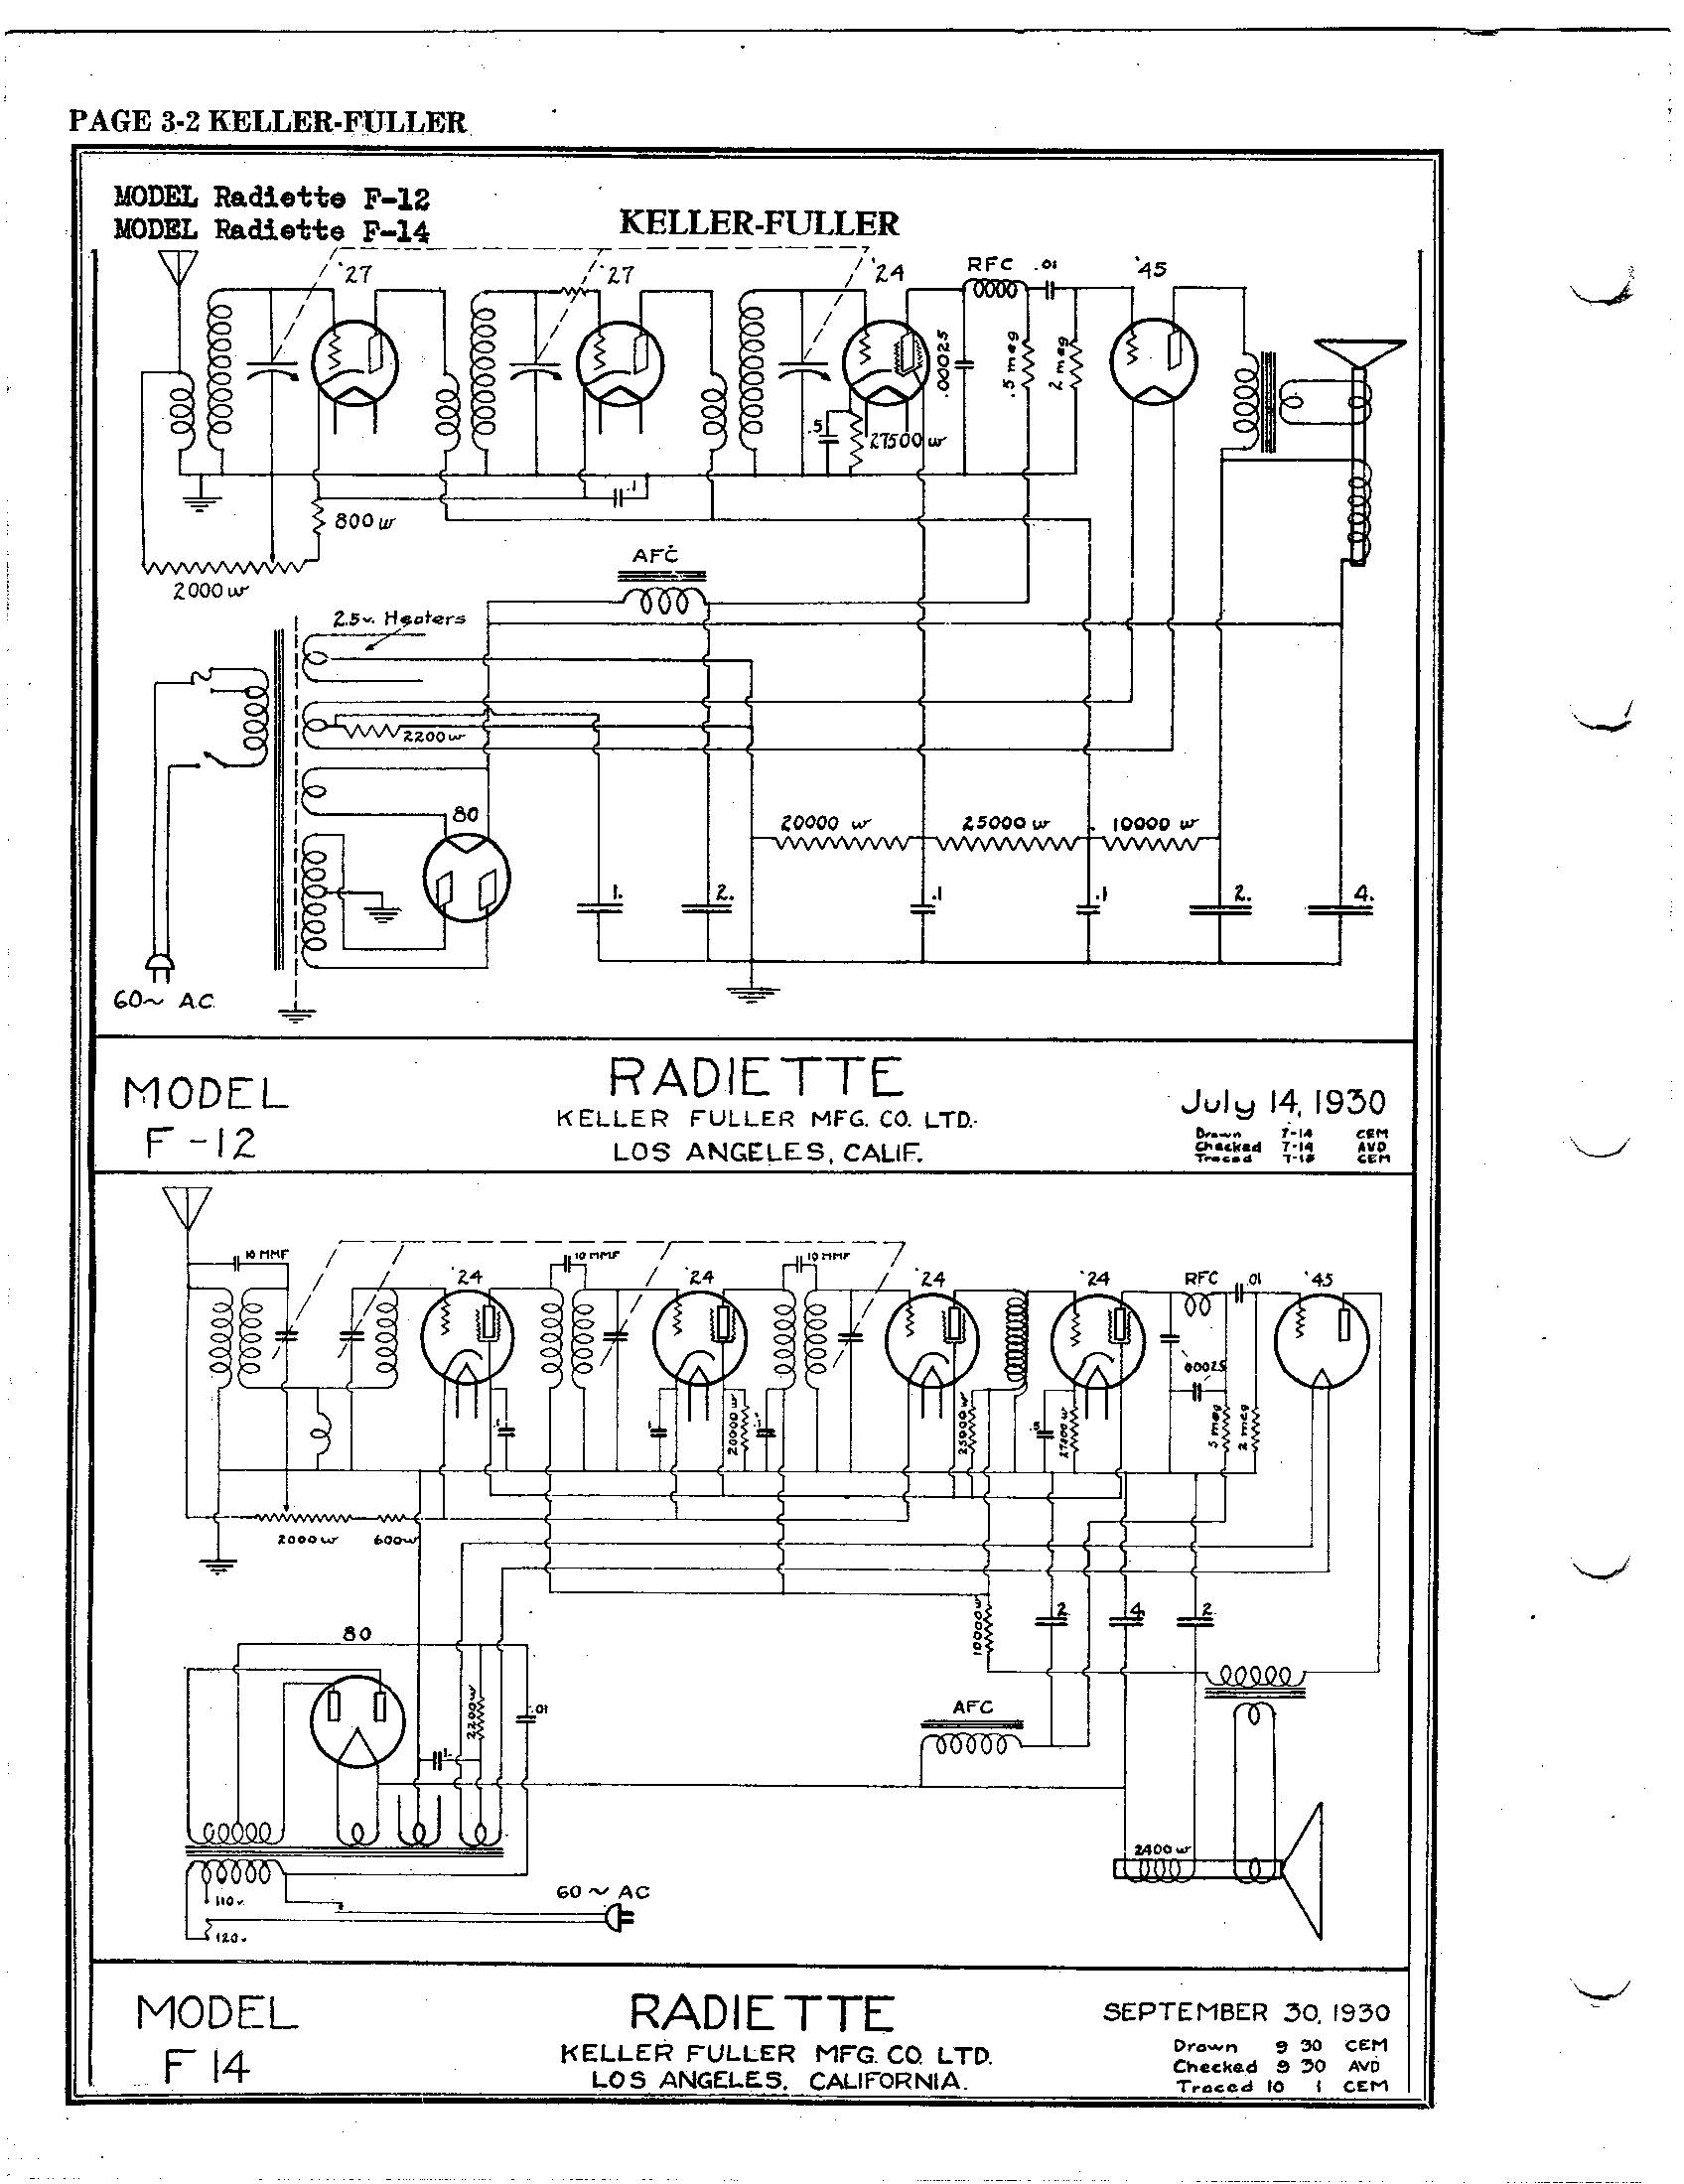 hight resolution of keller fuller radiette f 14 schematic